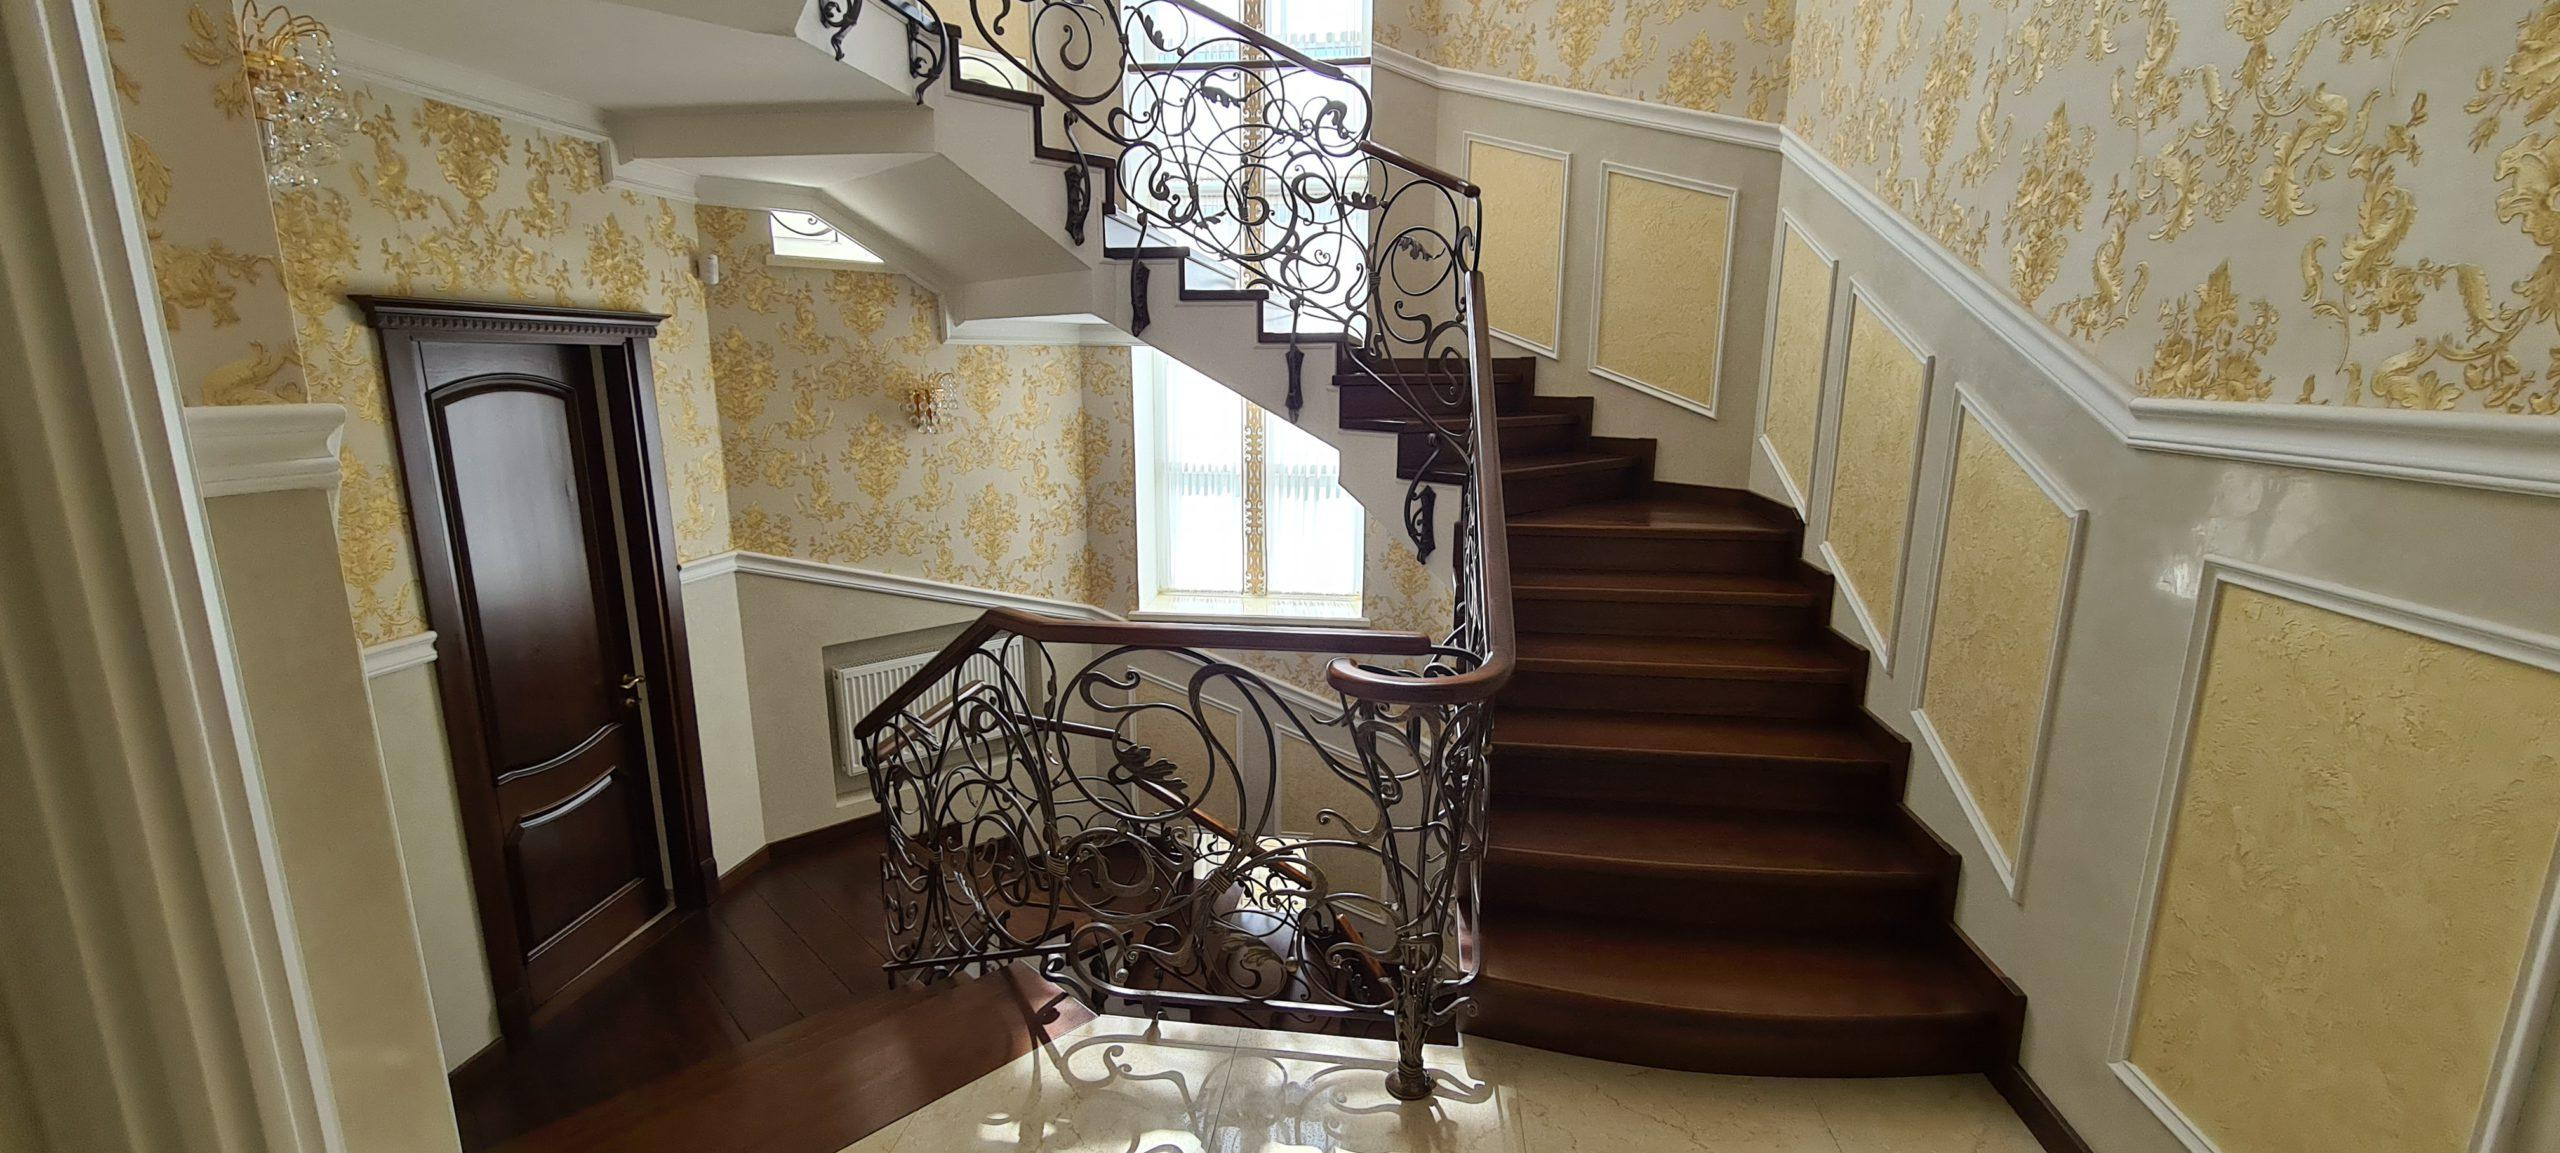 Лестница - фото 10